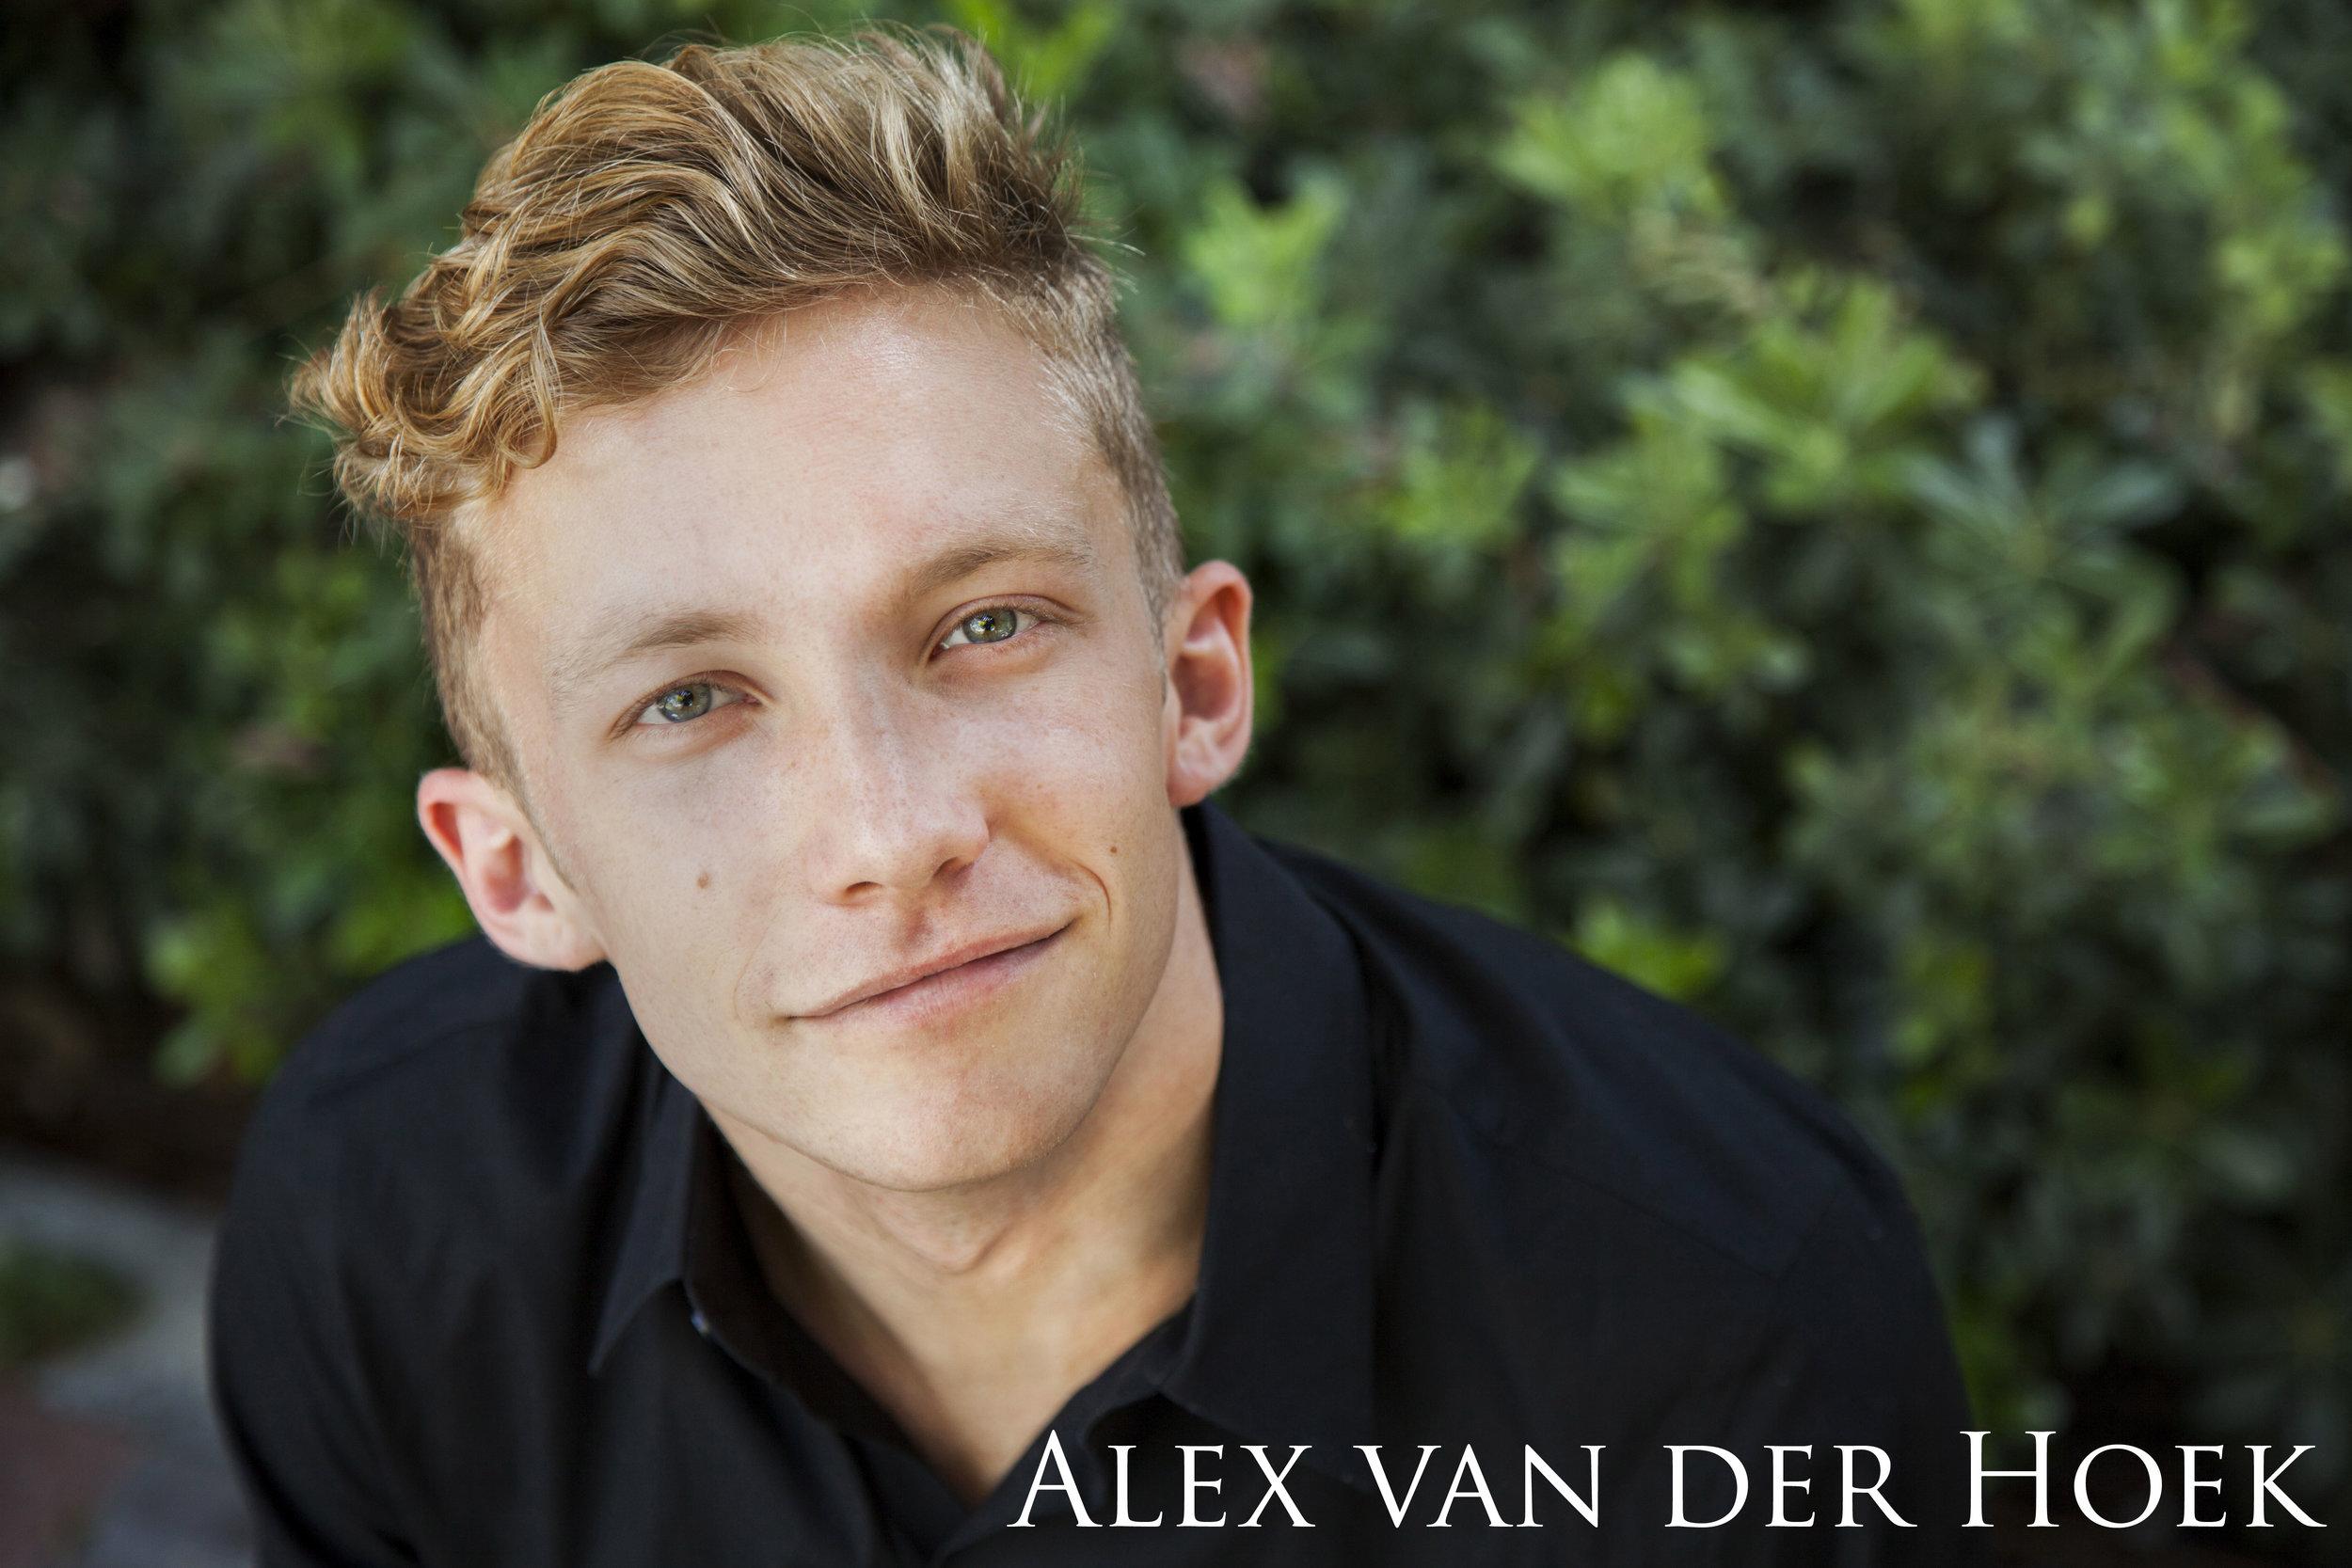 Alex van der Hoek headshot.jpg